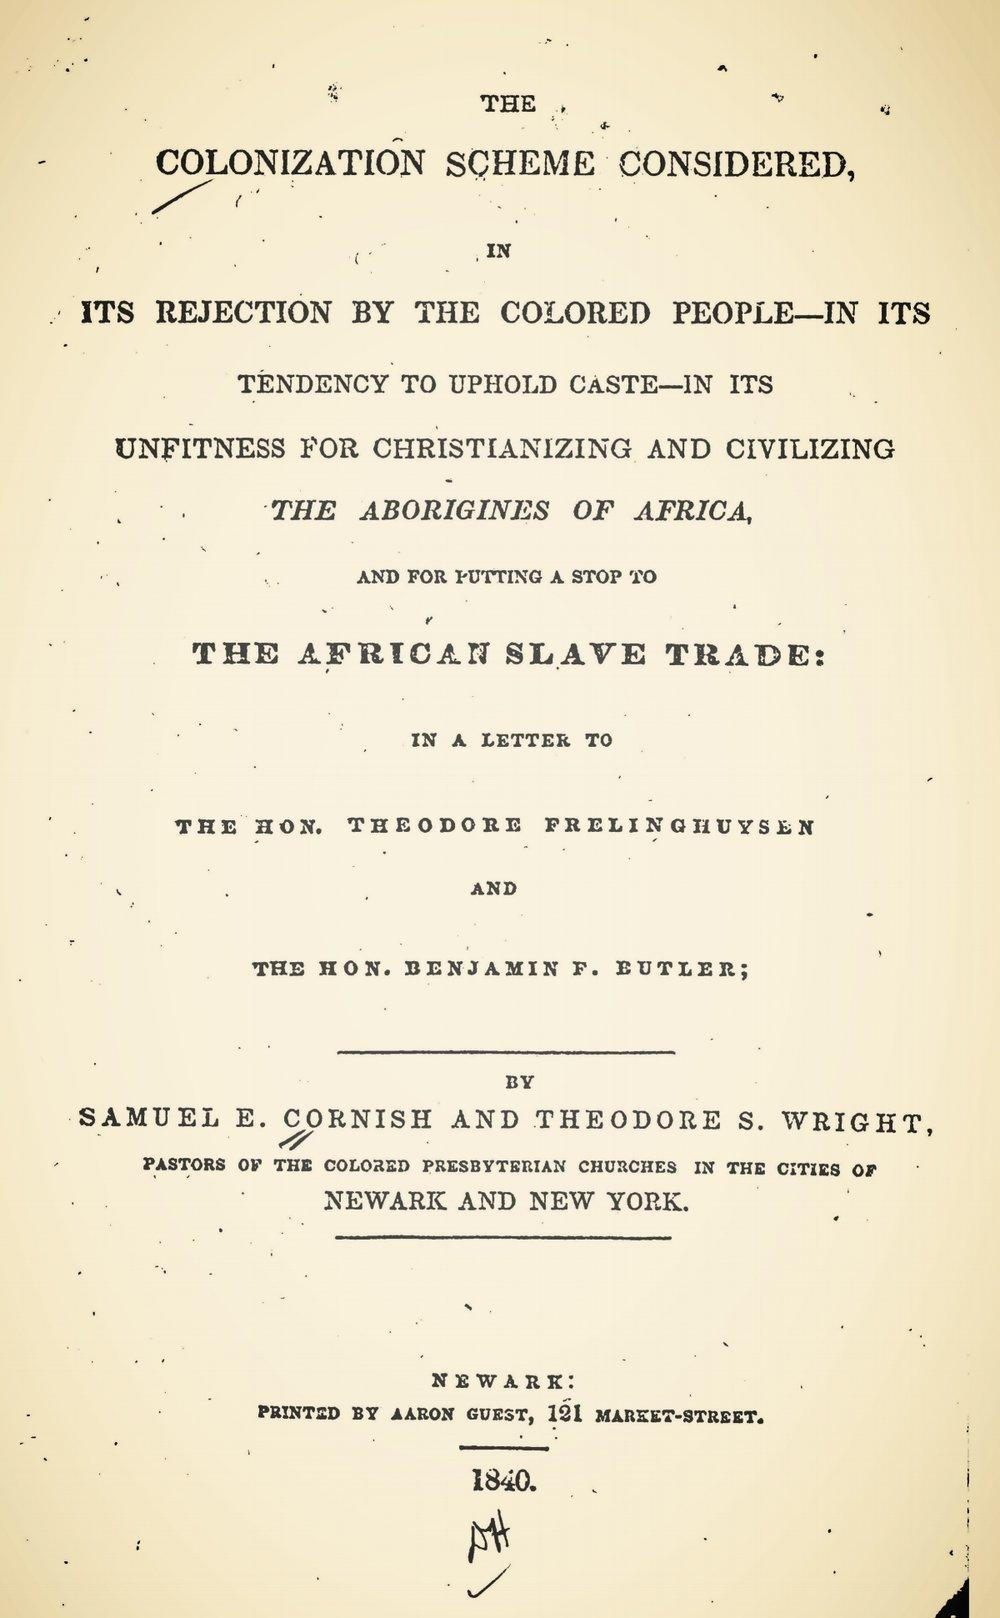 Cornish, Samuel Eli, The Colonization Scheme Considered Title Page.jpg